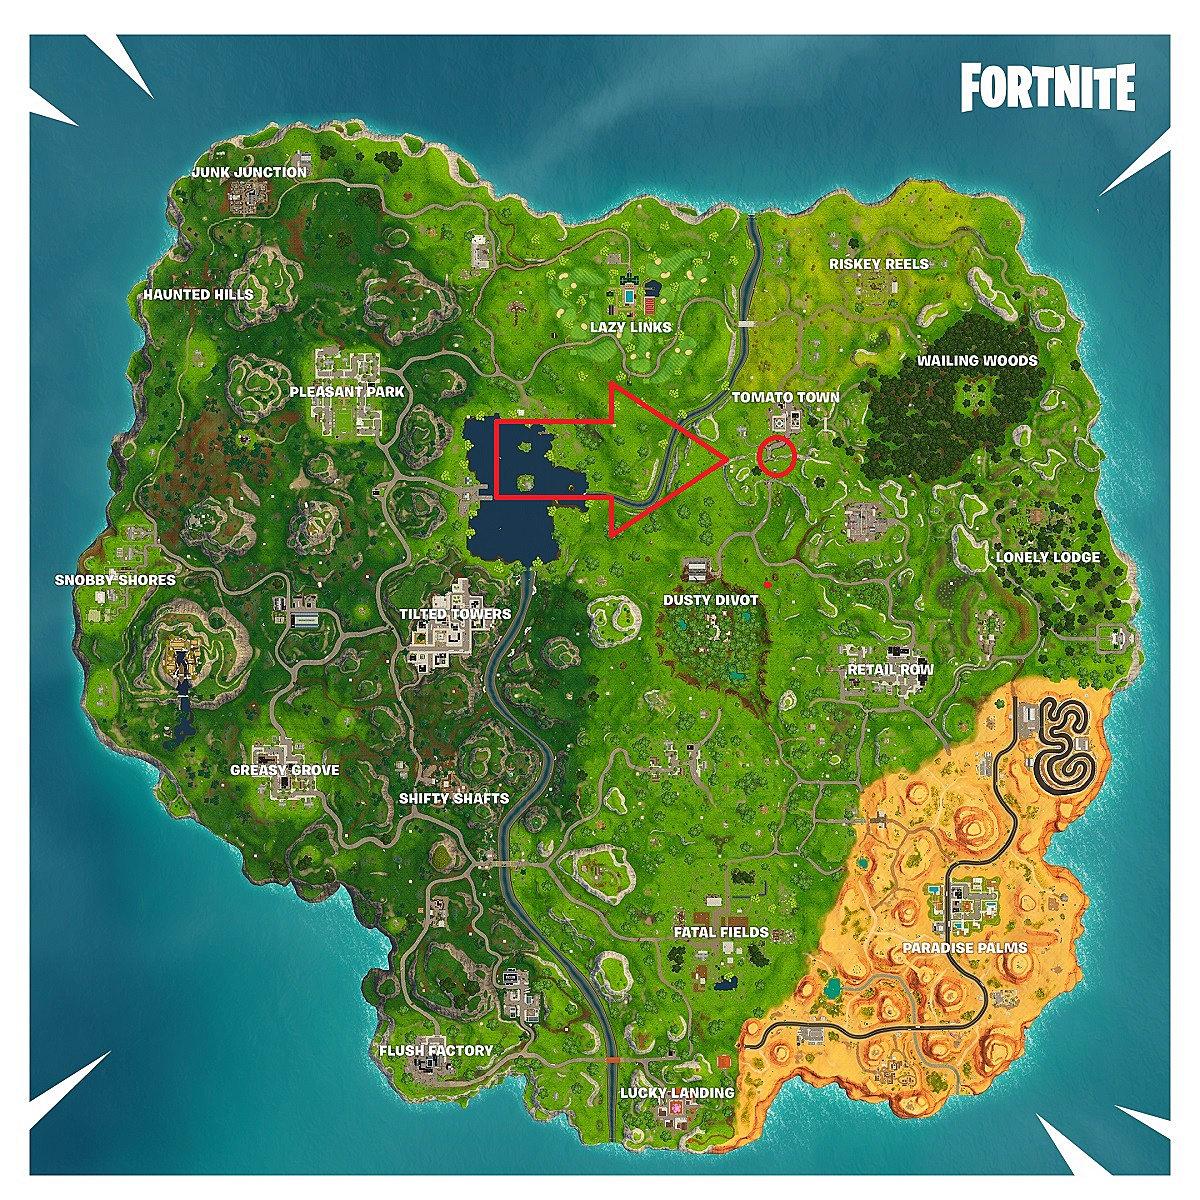 map showing the battle star for season 5 week 1 - fortnite treasure map risky reels